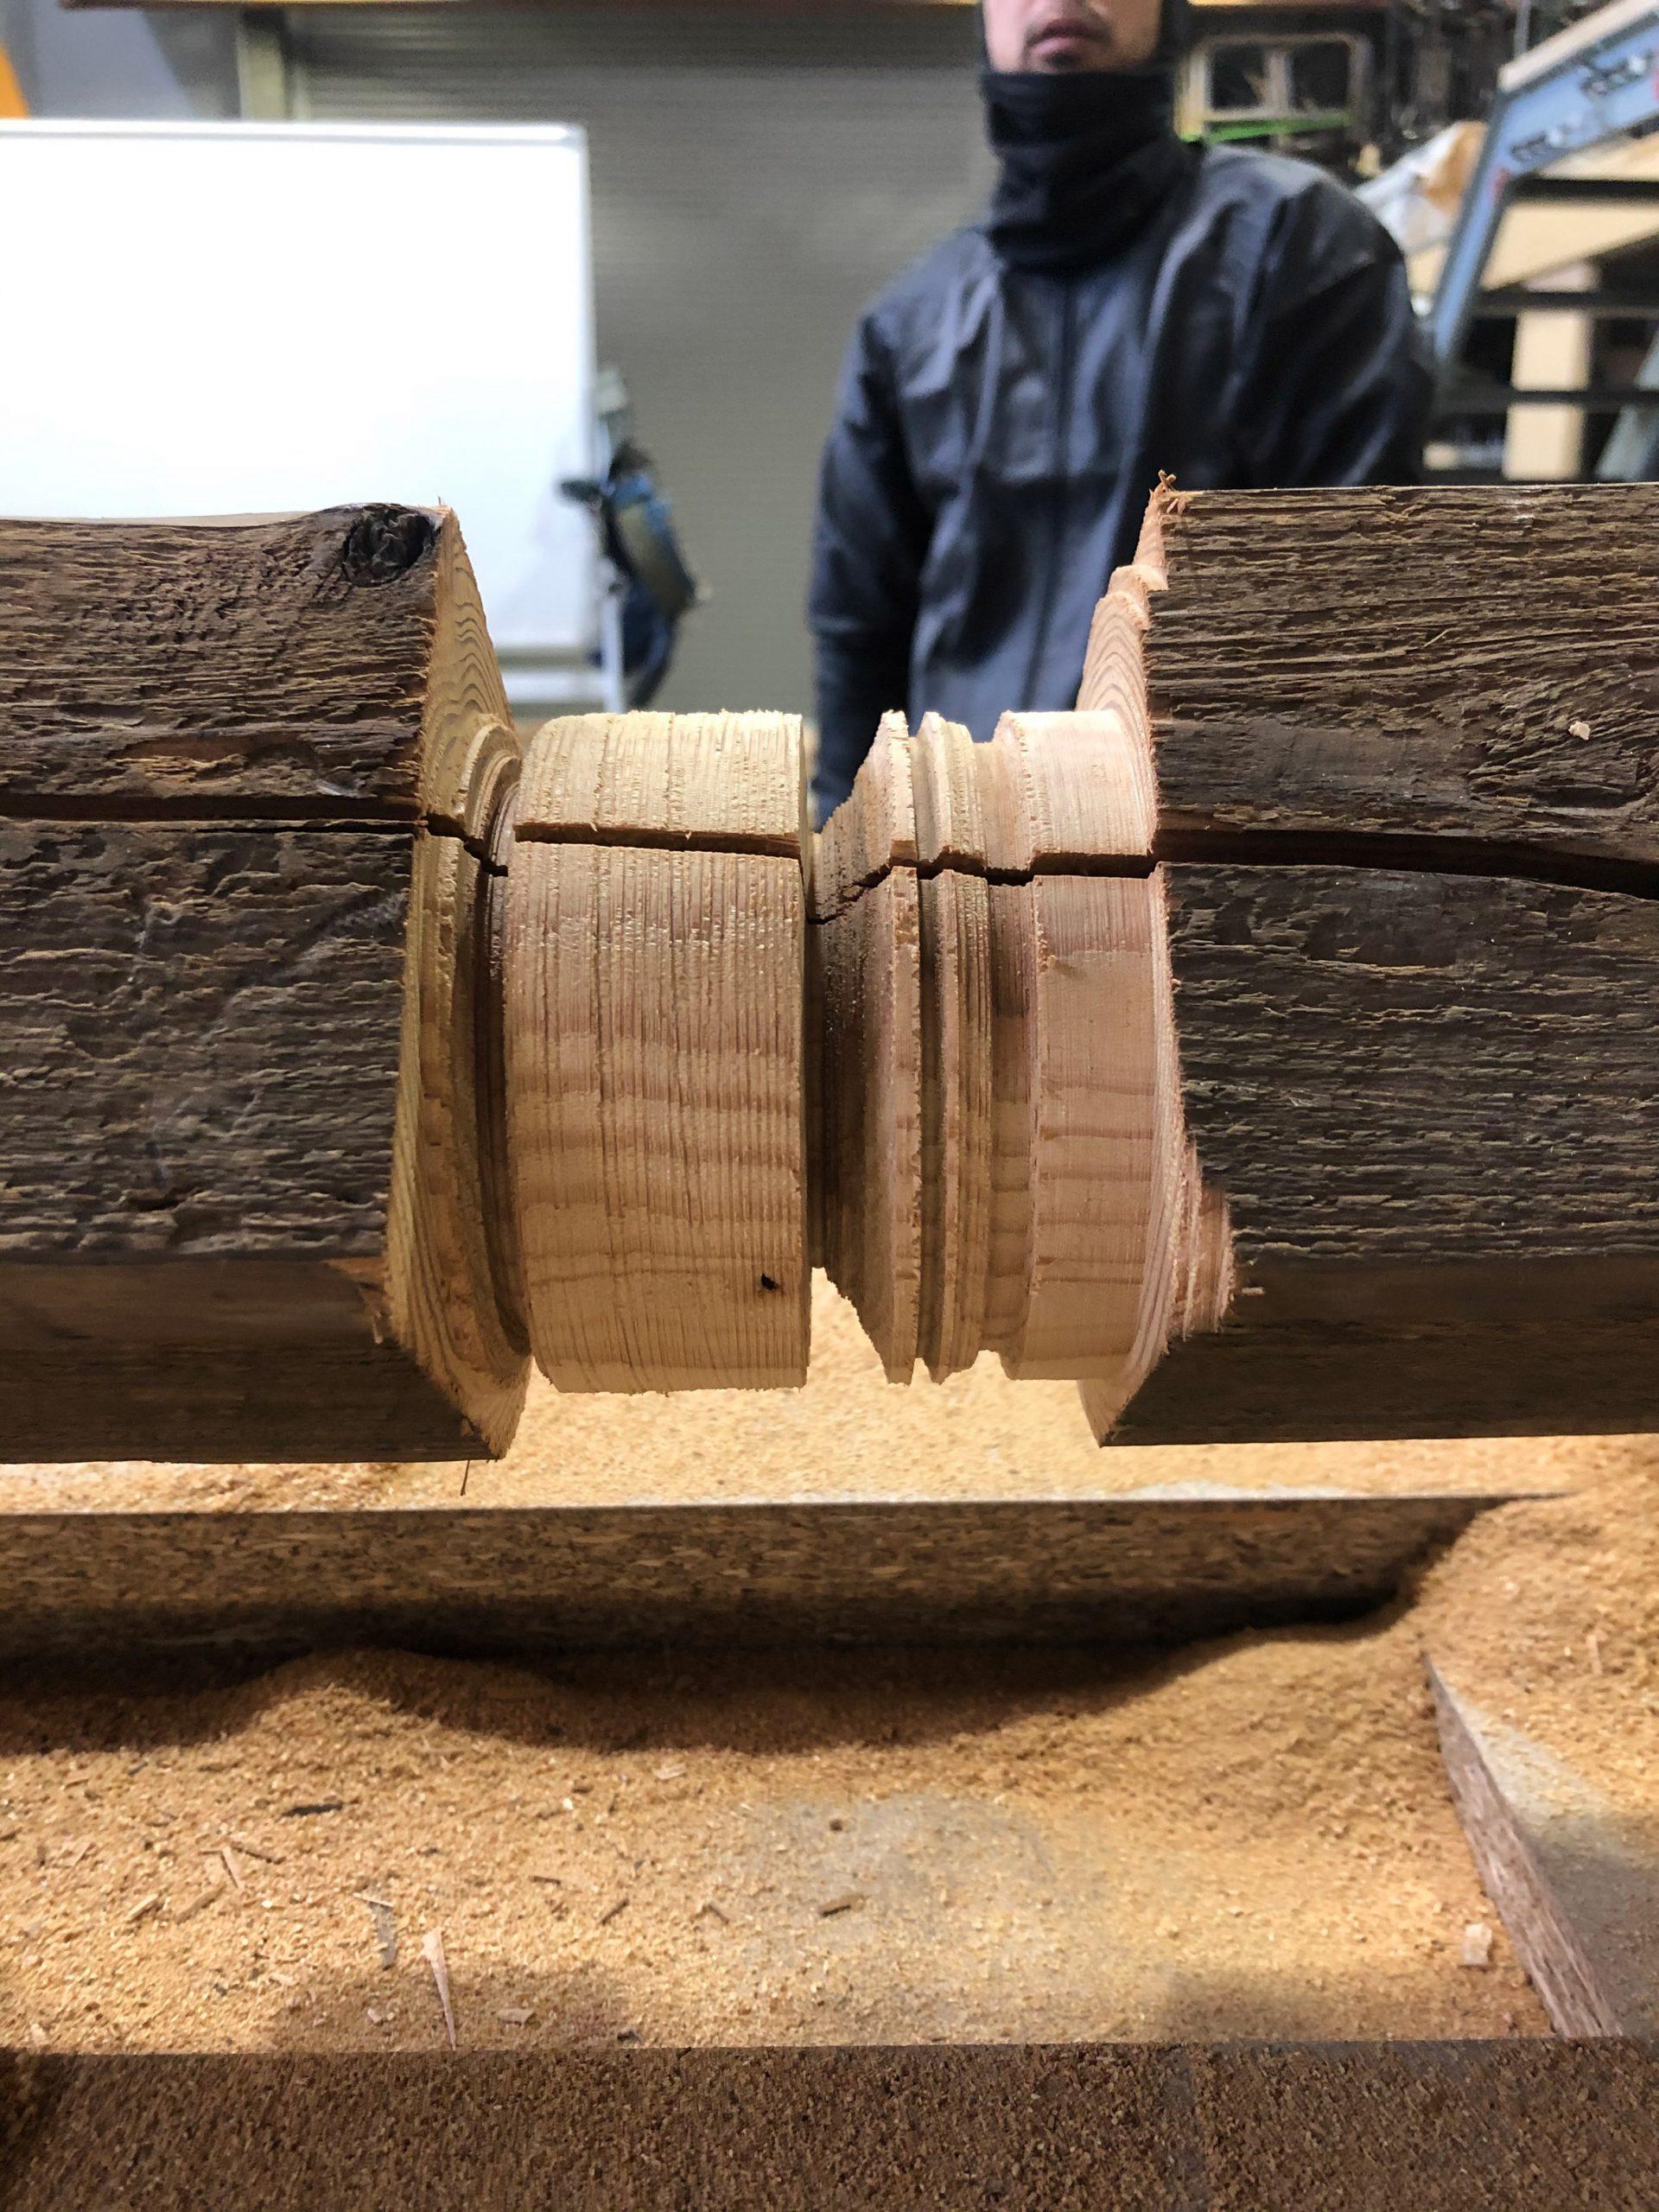 Wood cut with a circular saw lathe